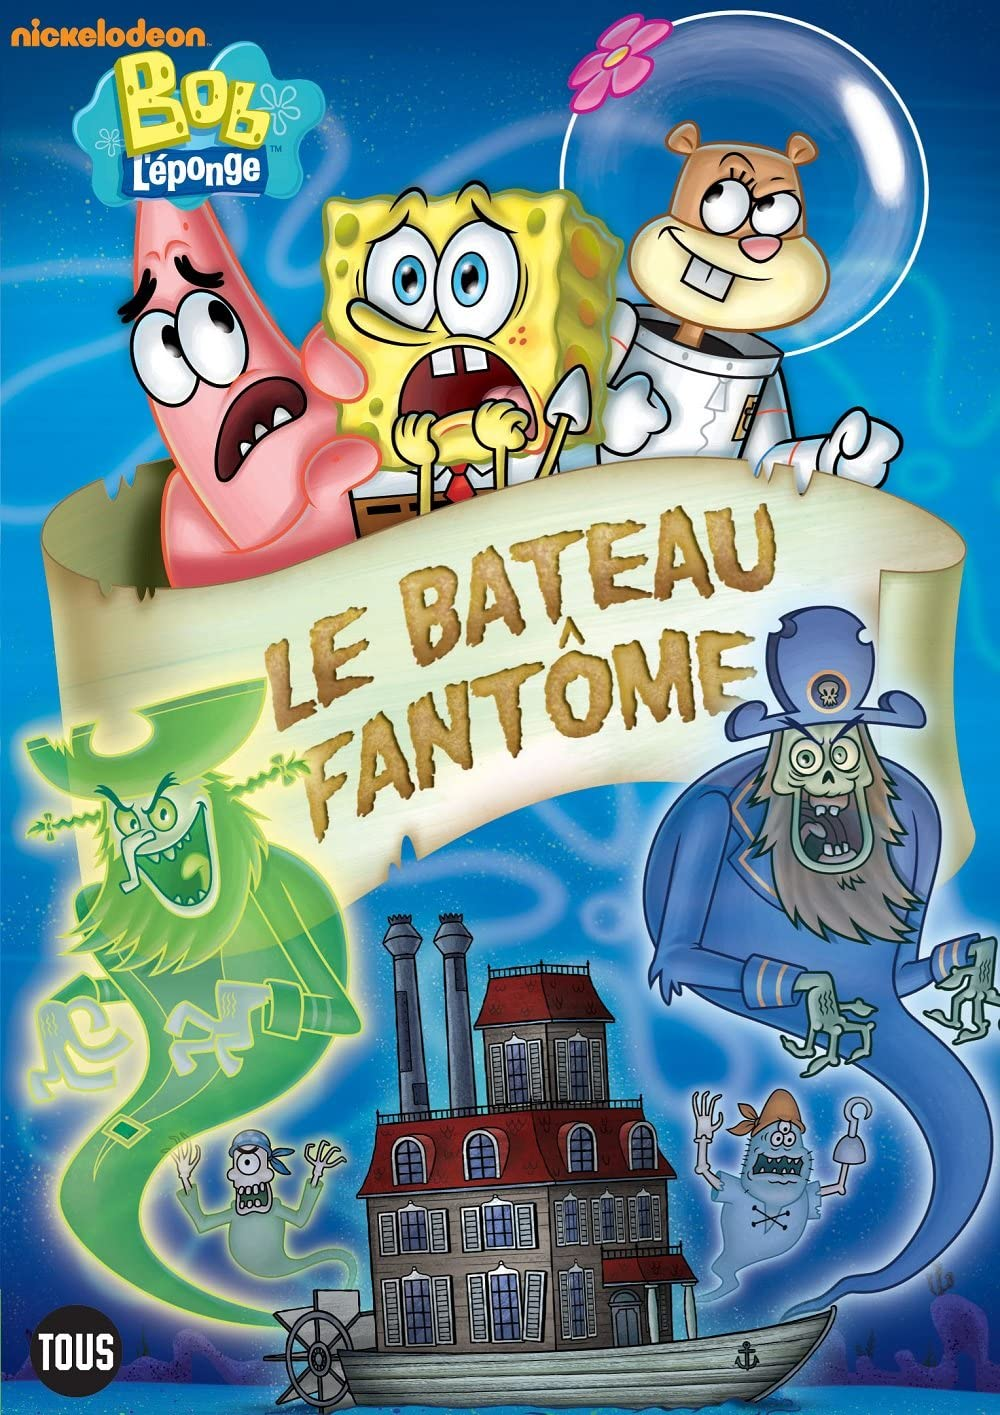 File:BOB L'EPONGE – LE BATEAU FANTOME.jpeg